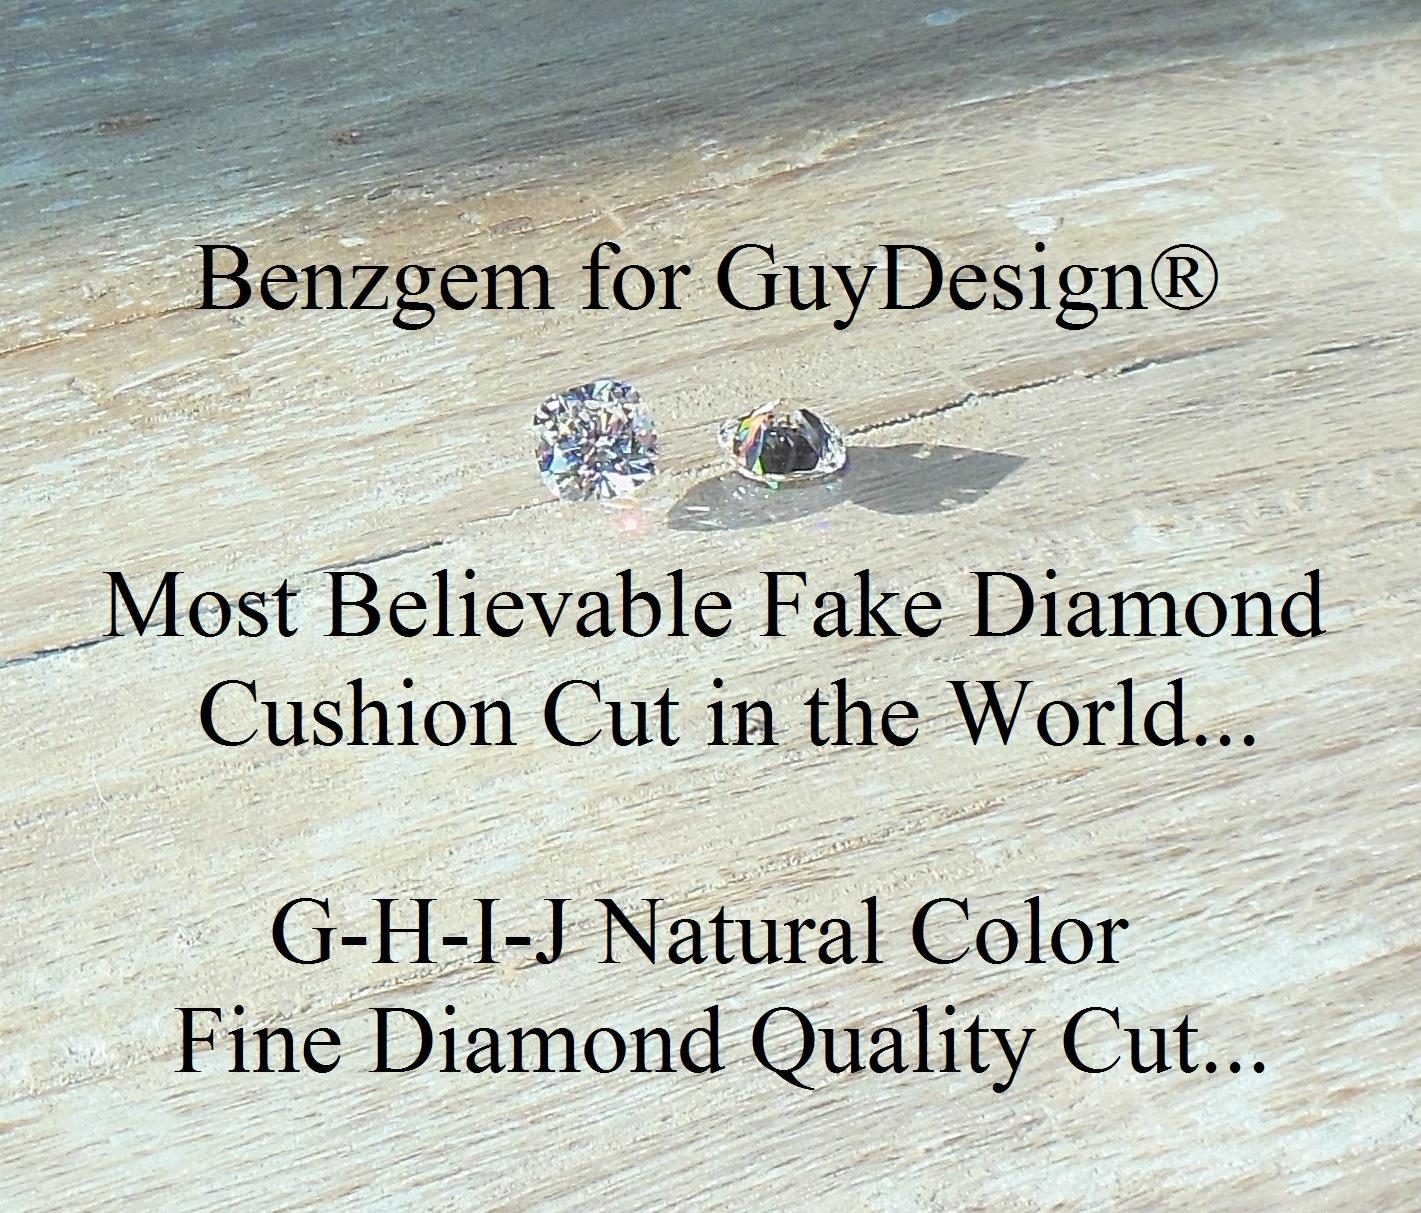 most-believable-fake-diamond-cushion-cut-in-the-world-benzgem-for-guydesign-.jpg